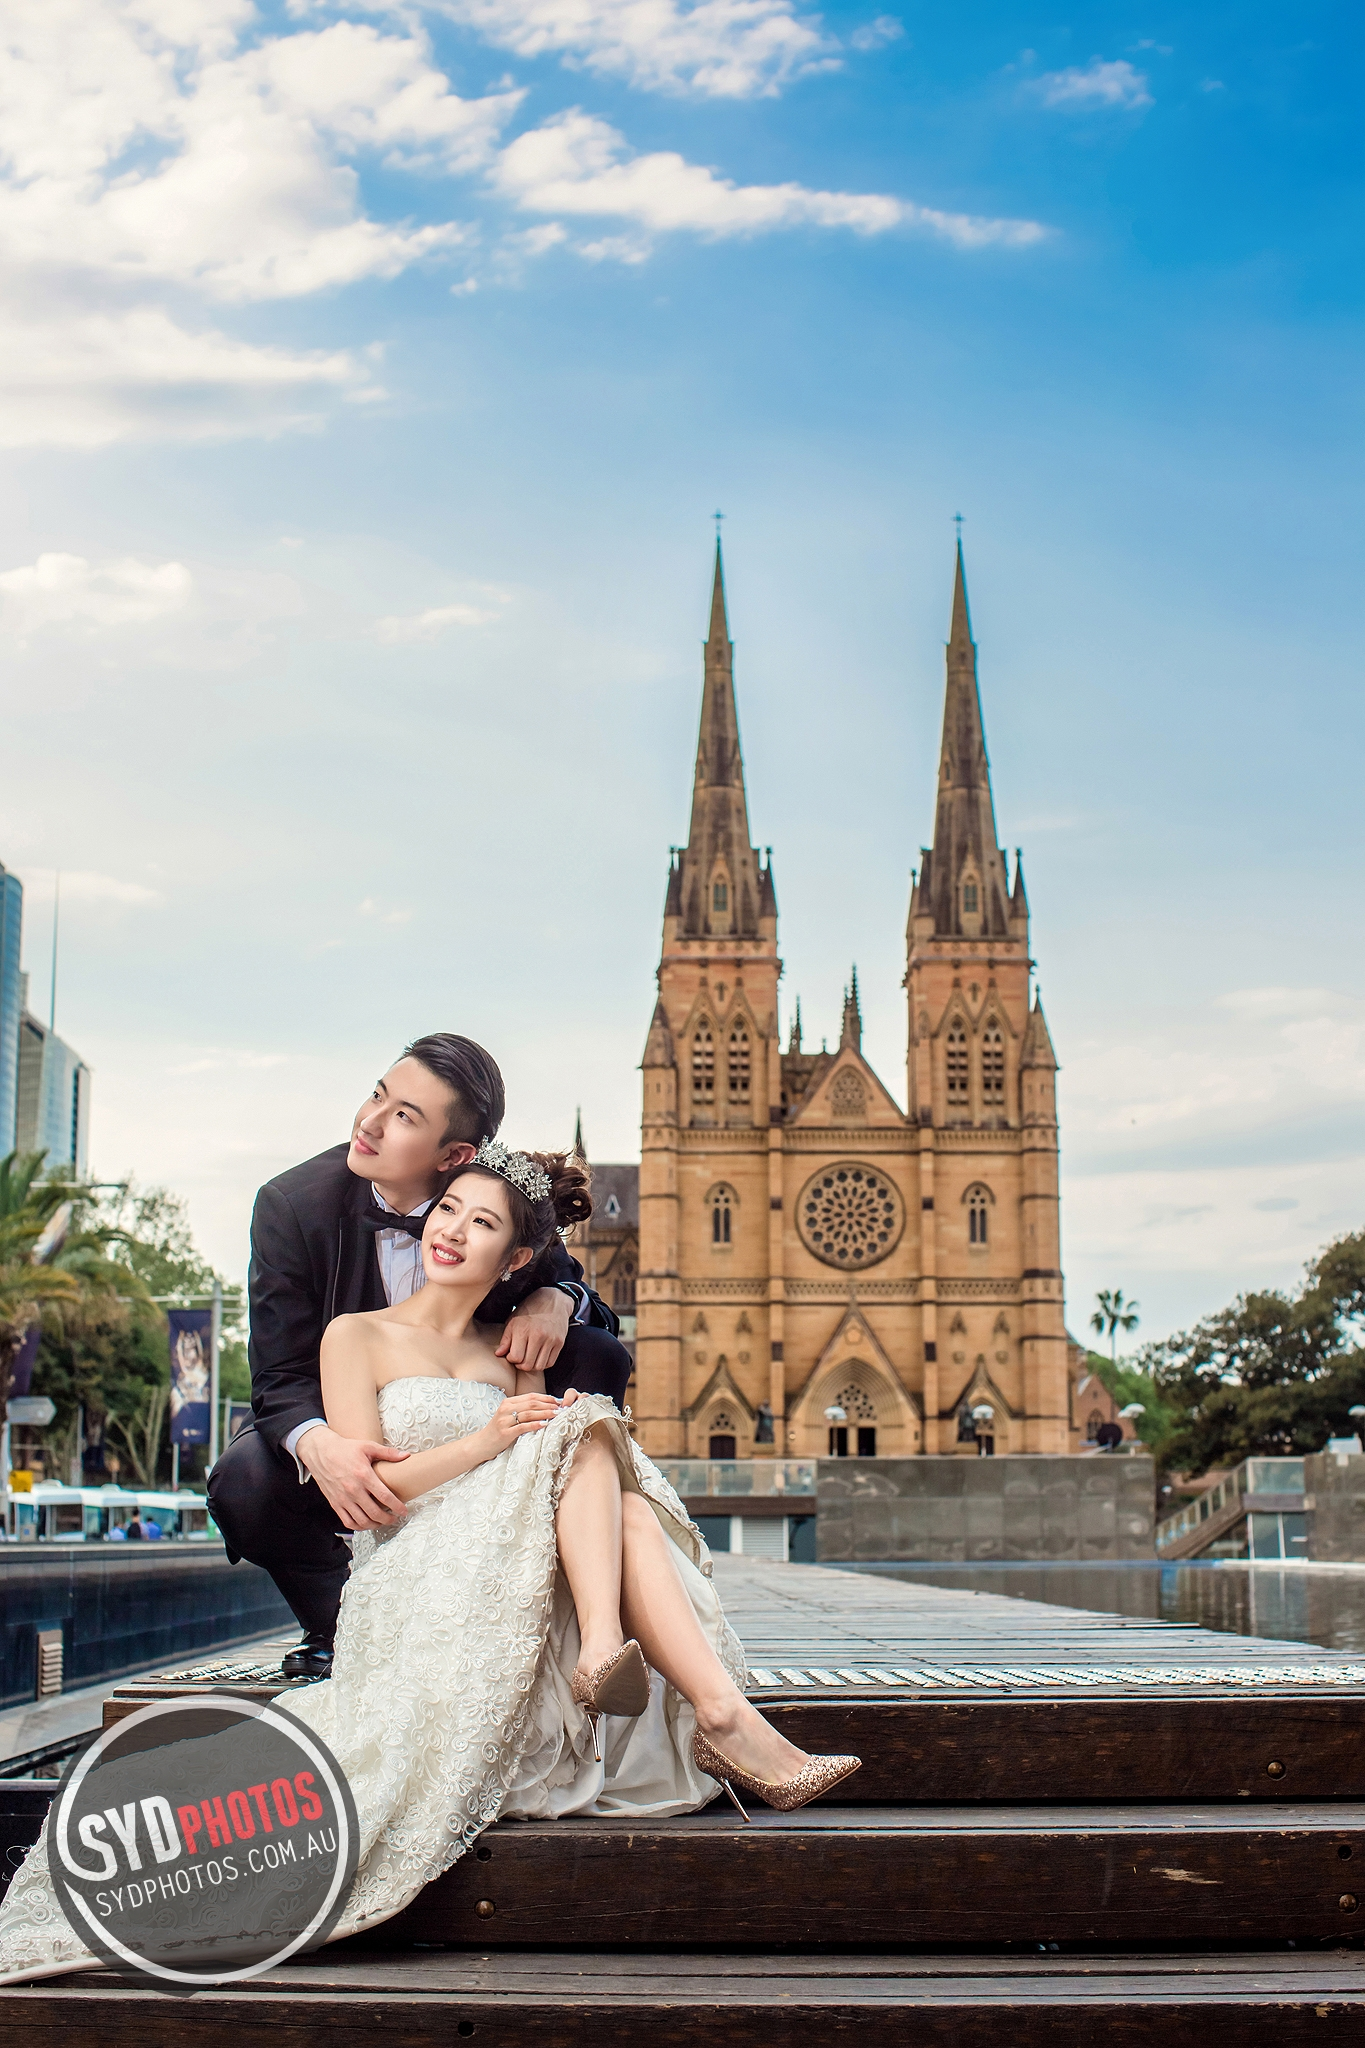 ID-90691-白天的雨-Prewedding-悉尼婚纱摄影 -01